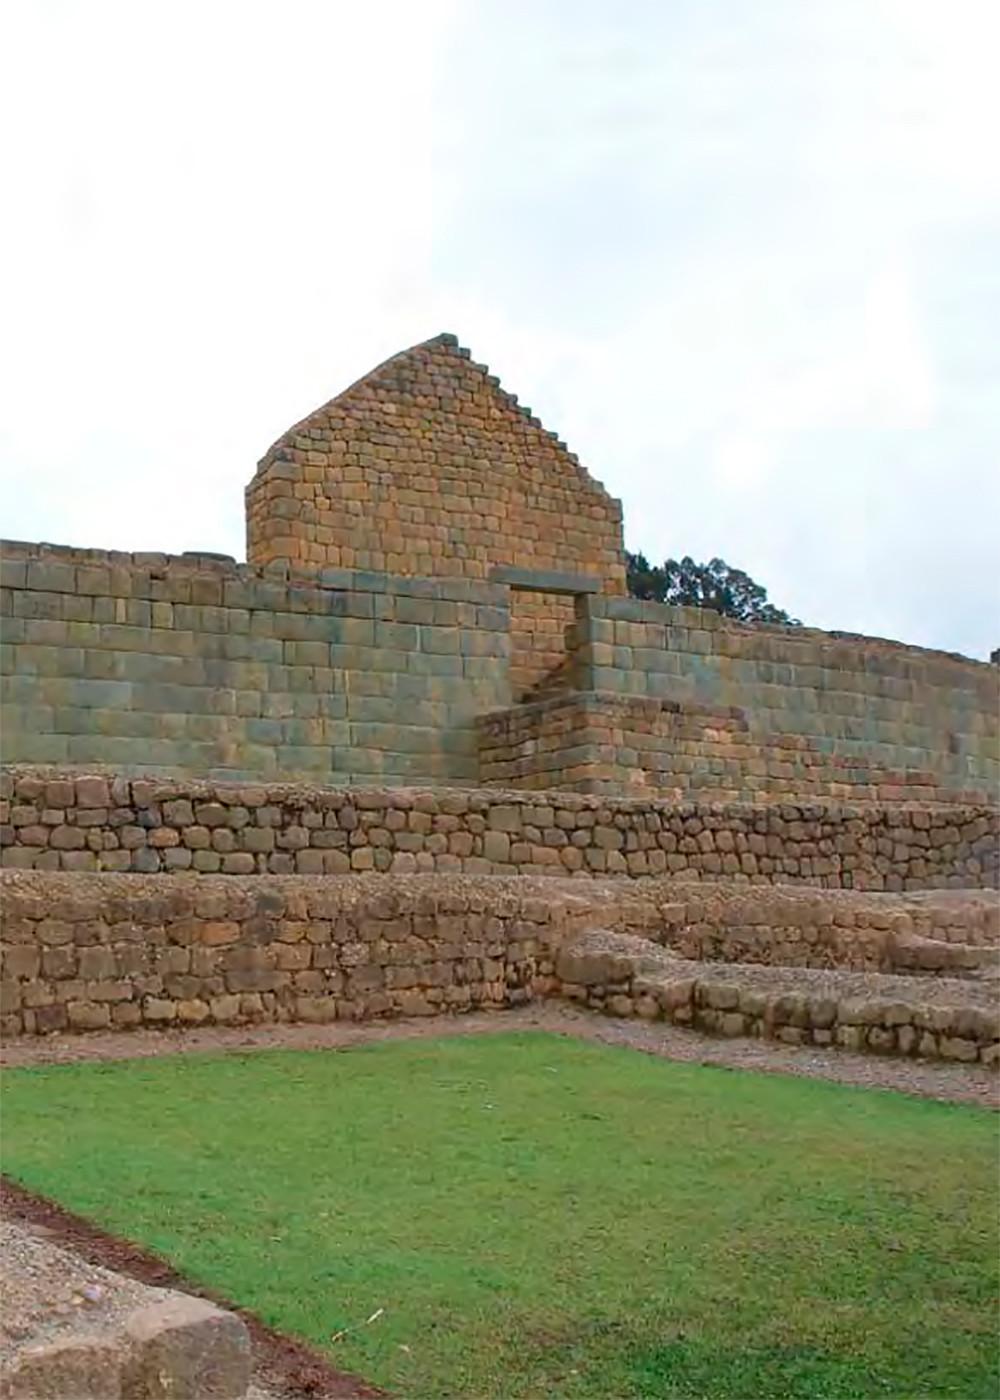 Храм Солнца. Ингапирка. Источник: Complejo Arqueológico de Ingapirca, Instituto Nacional de Patrimonio Cultural.